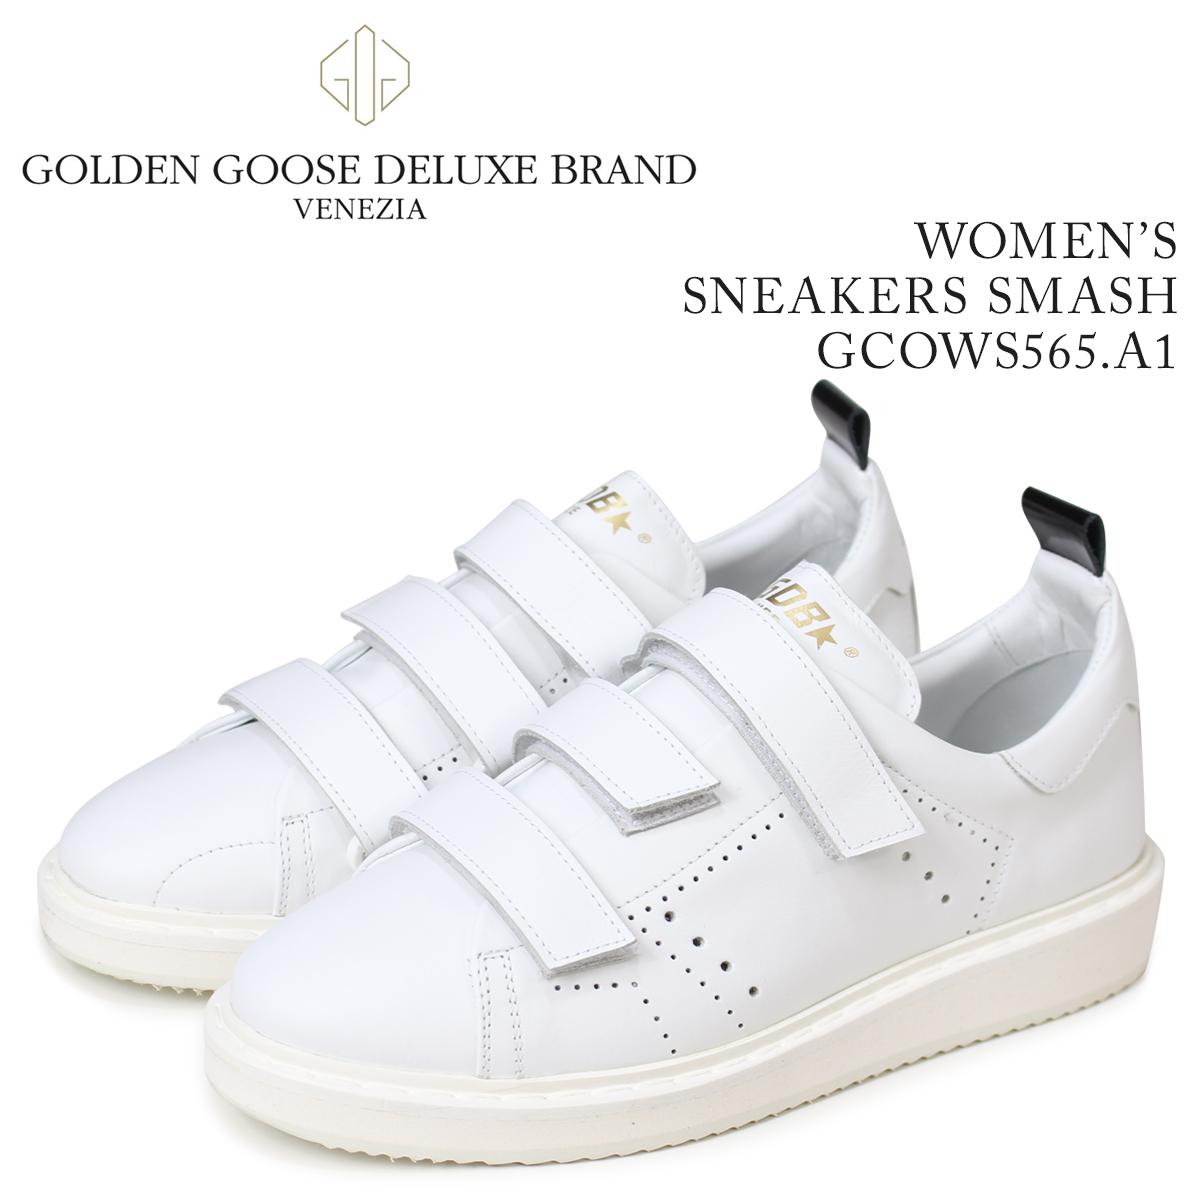 Golden Goose ゴールデングース スニーカー レディース スニーカーズ スマッシュ SNEAKERS SMASH ホワイト GCOWS565 A1